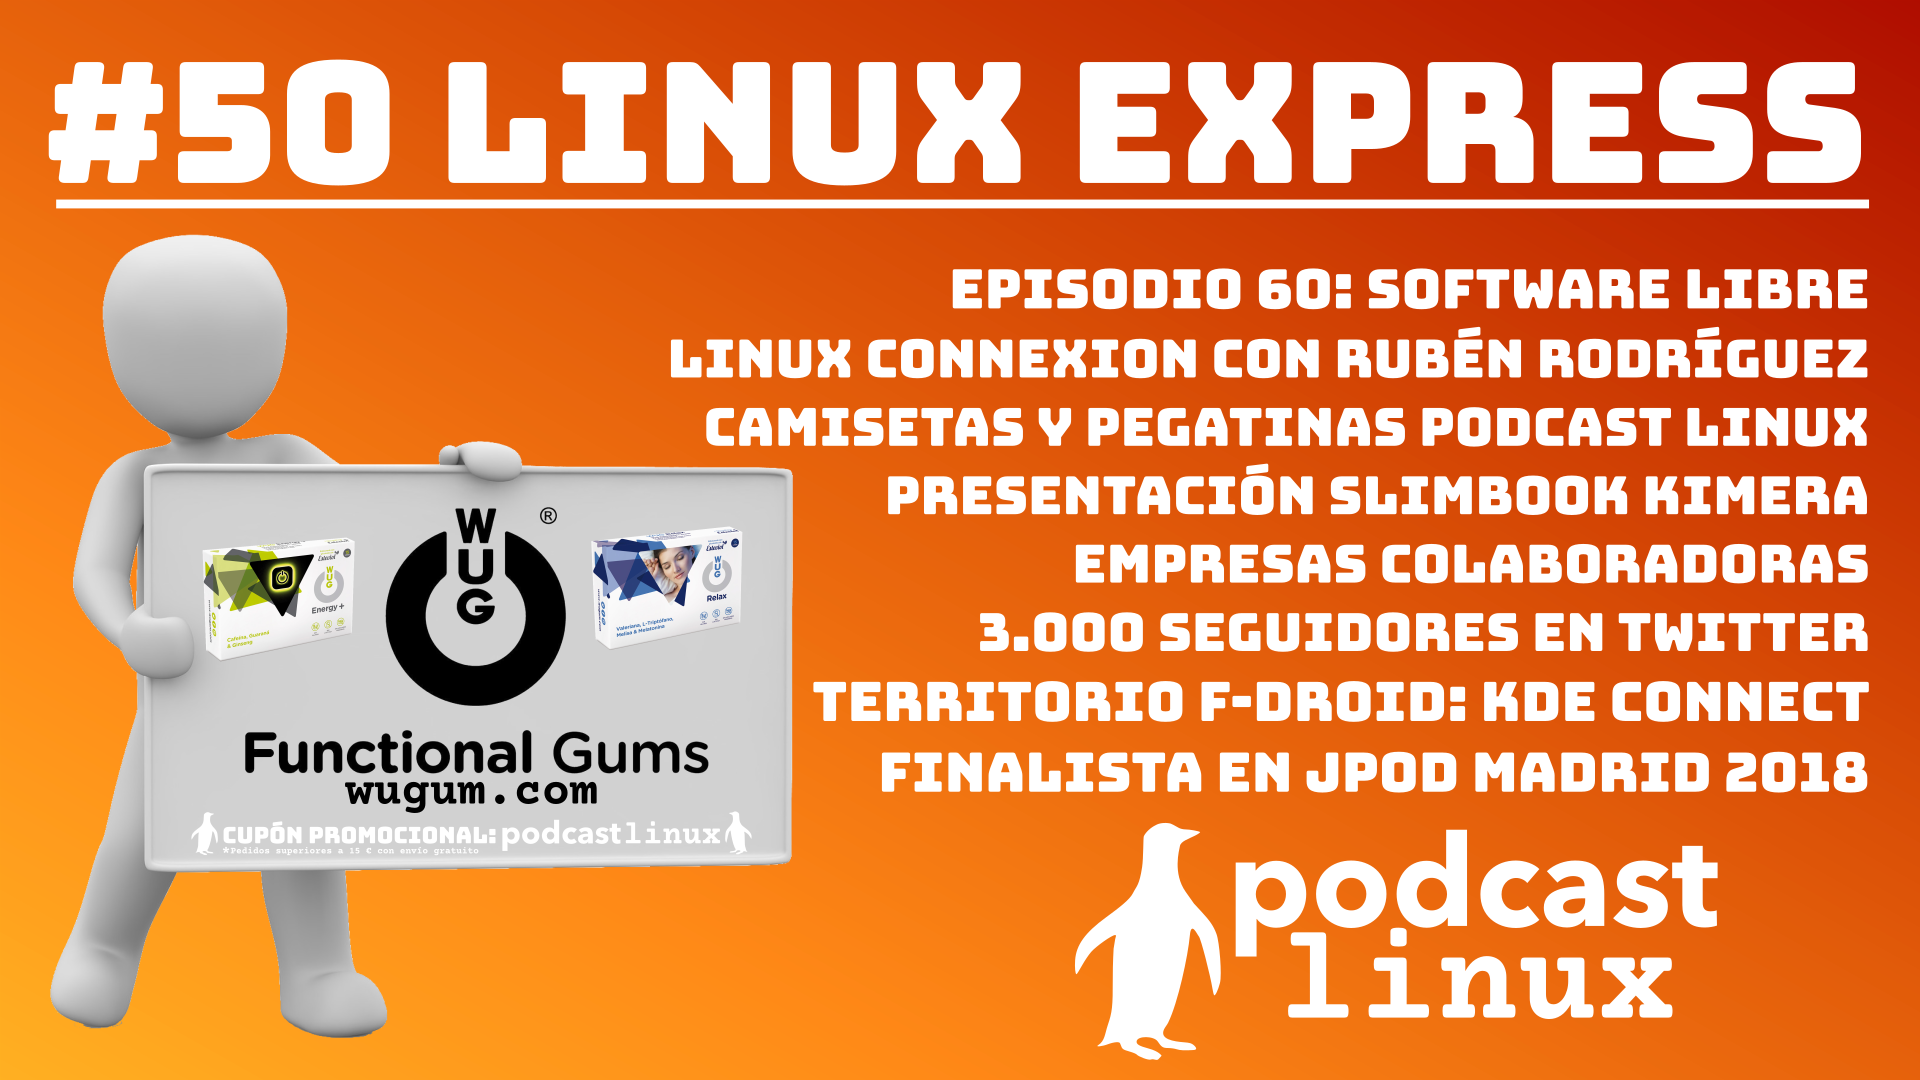 #50 Linux Express